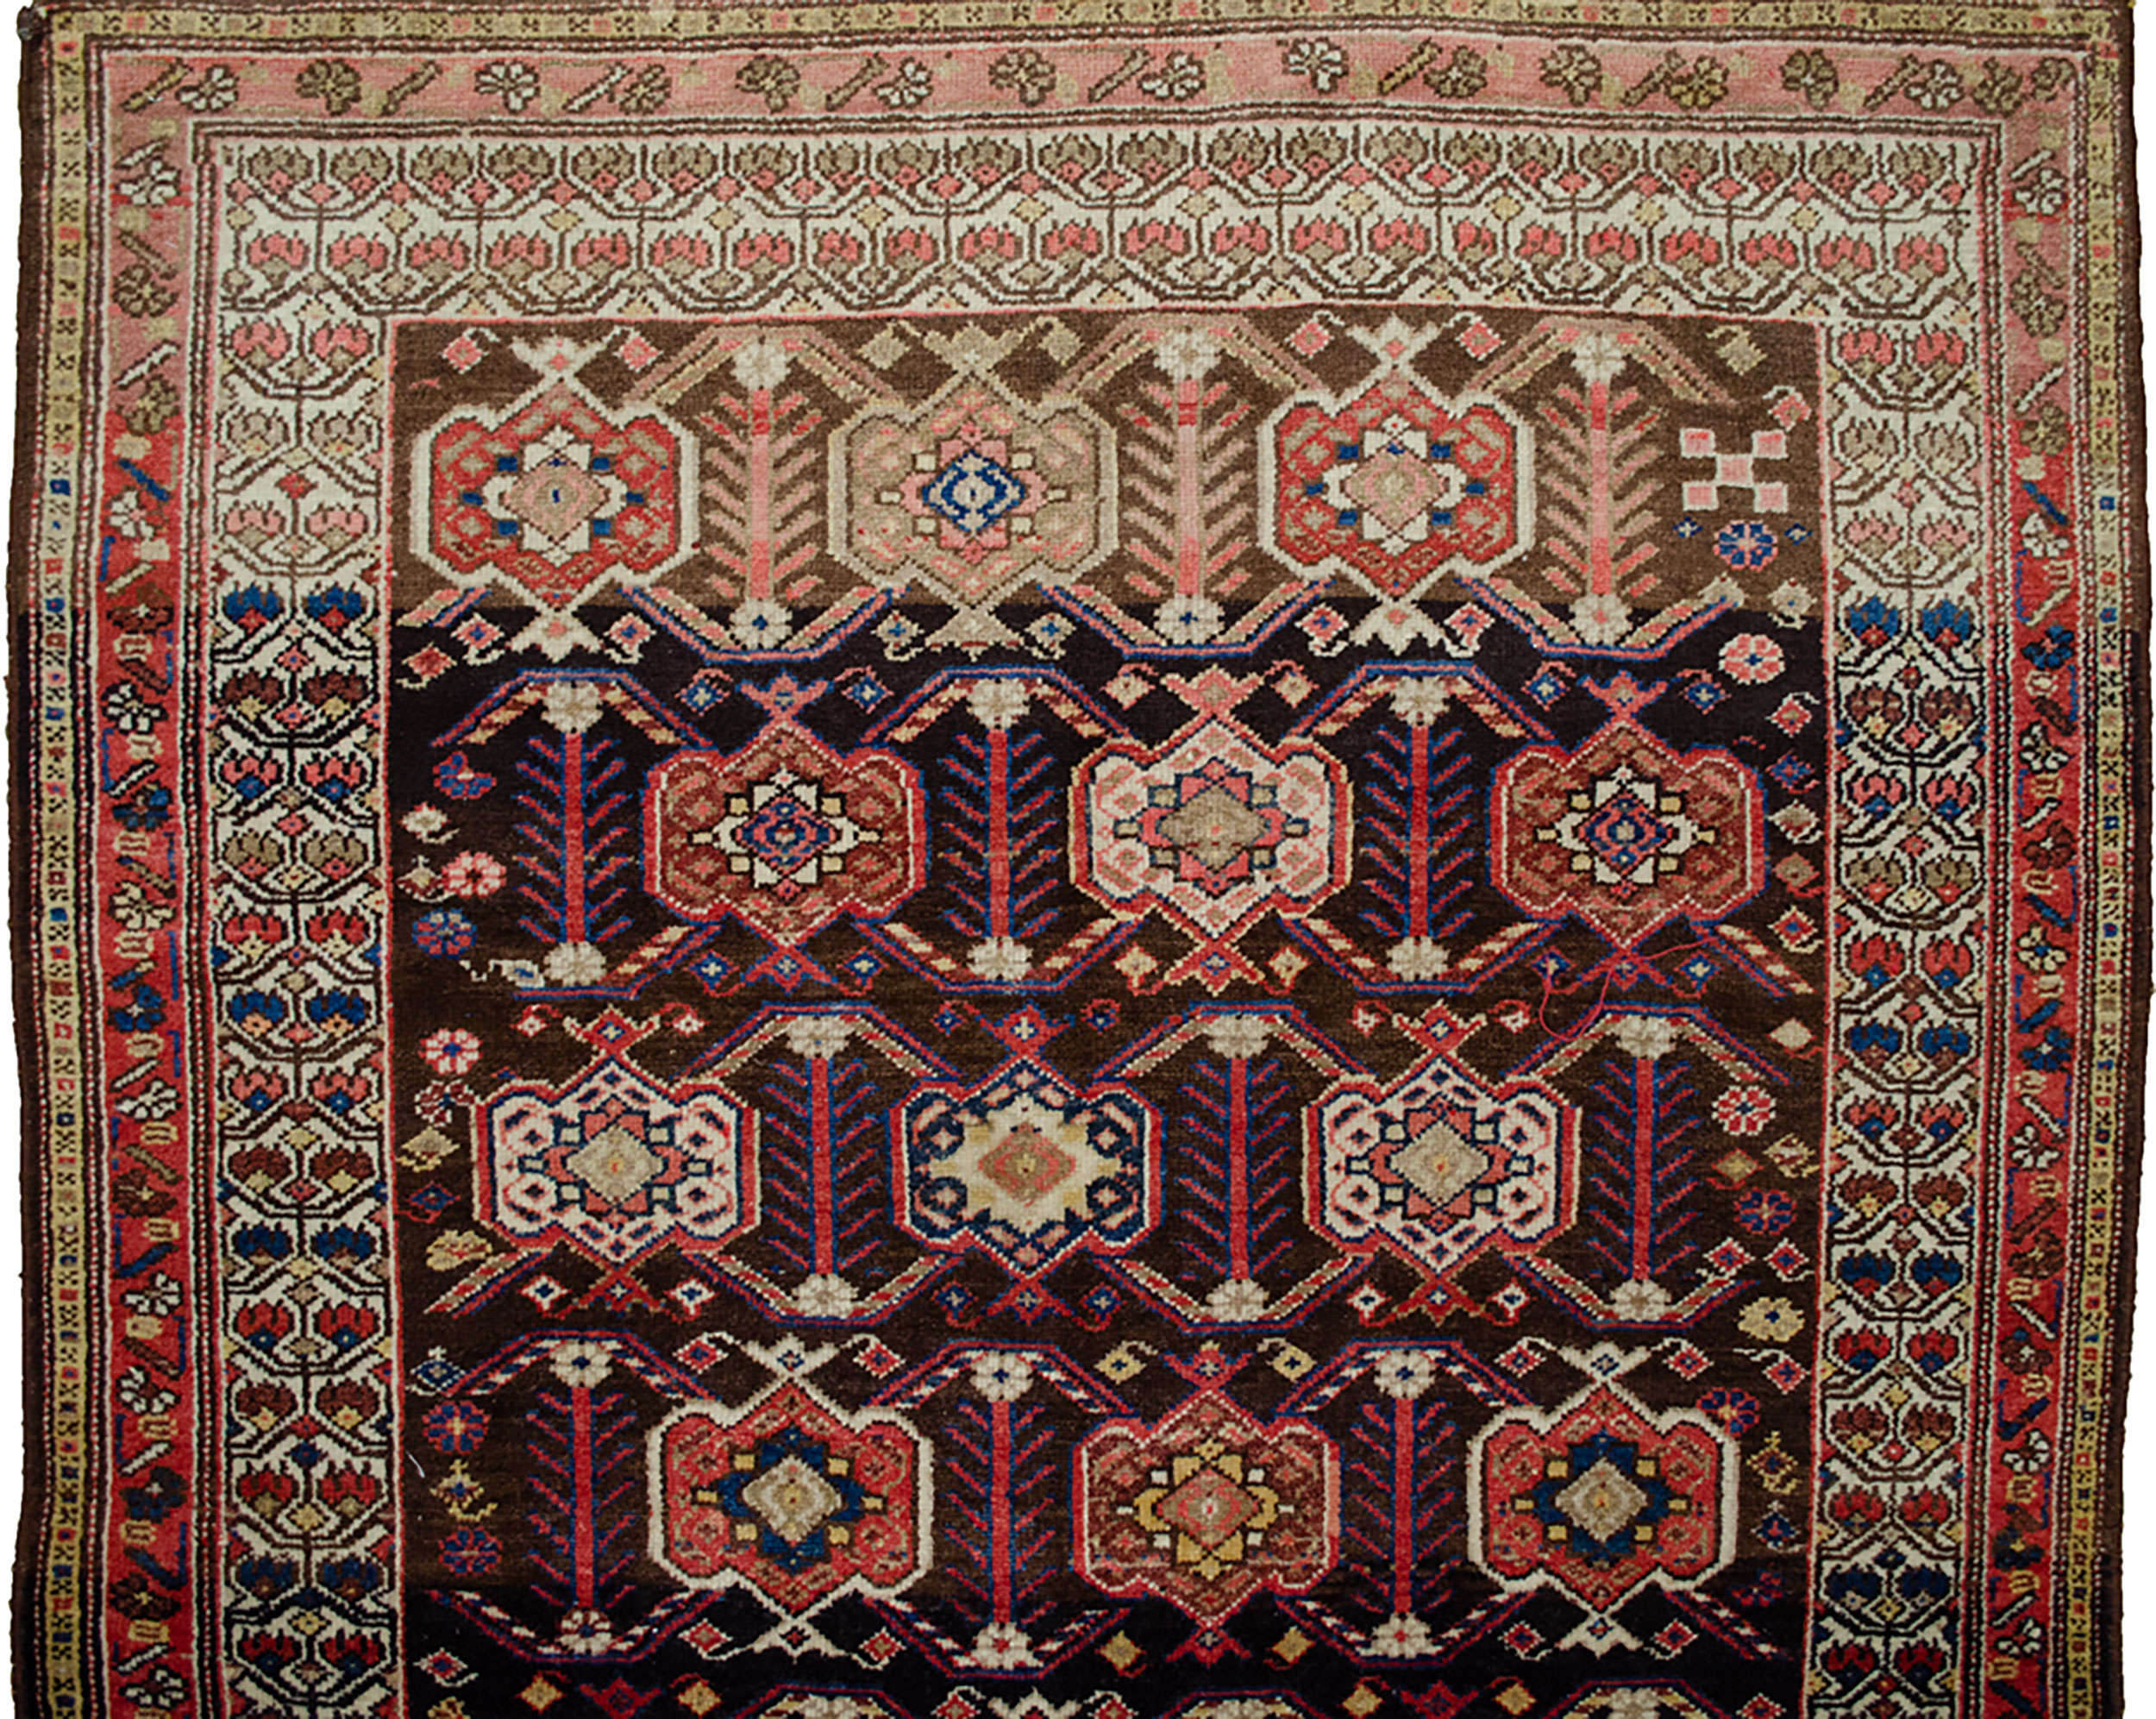 Antique Shahsavan Rug 206x129cm